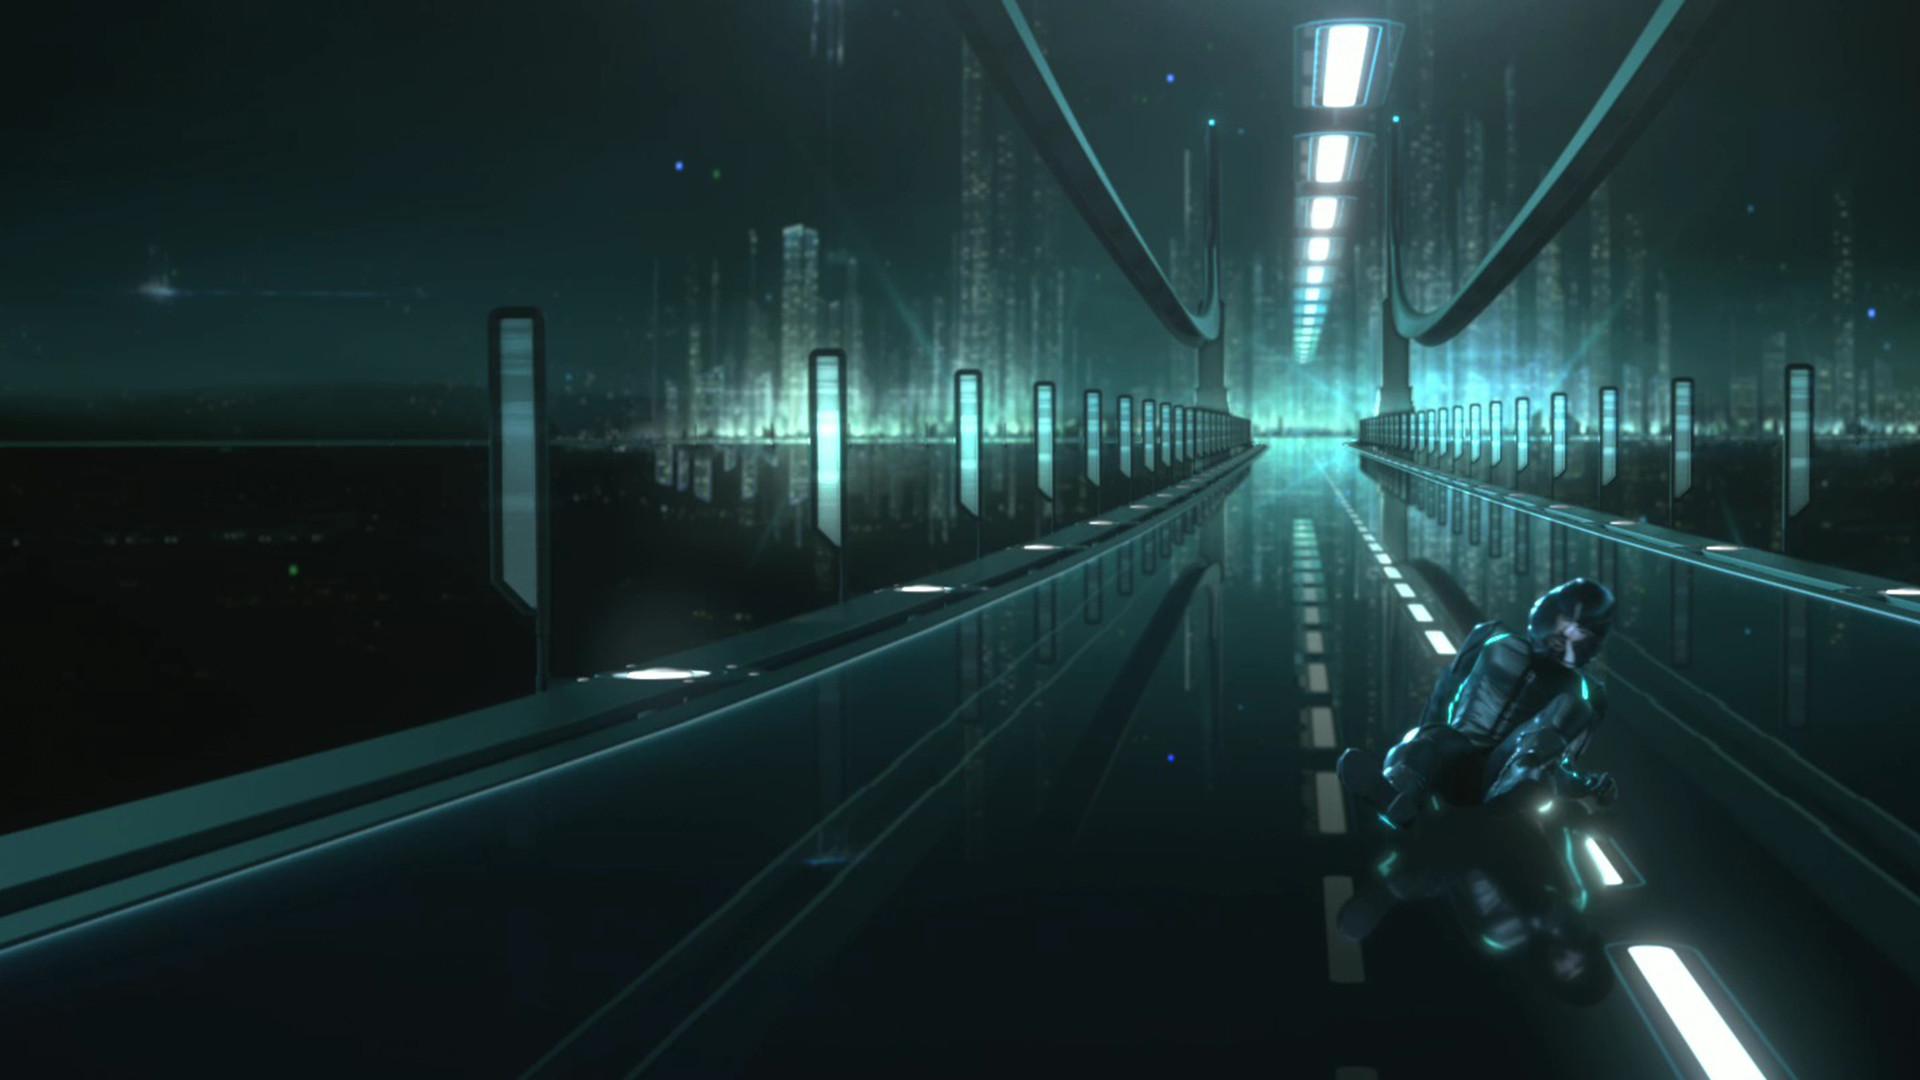 Tron Legacy Wallpaper 1080p (67+ images)